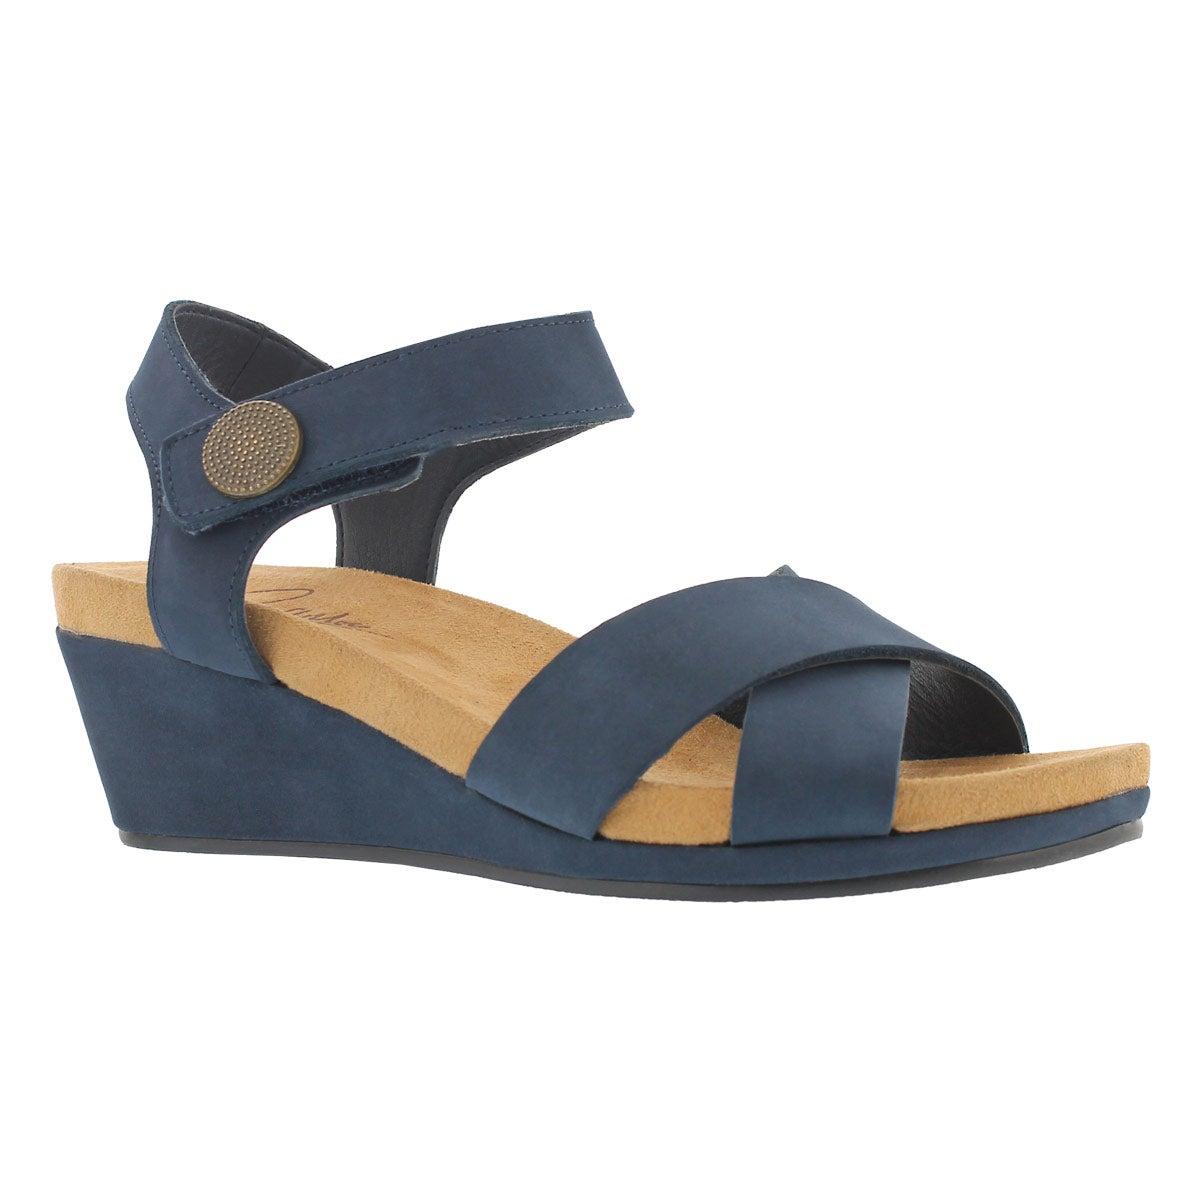 Women's ANNALISA navy casual wedge sandals